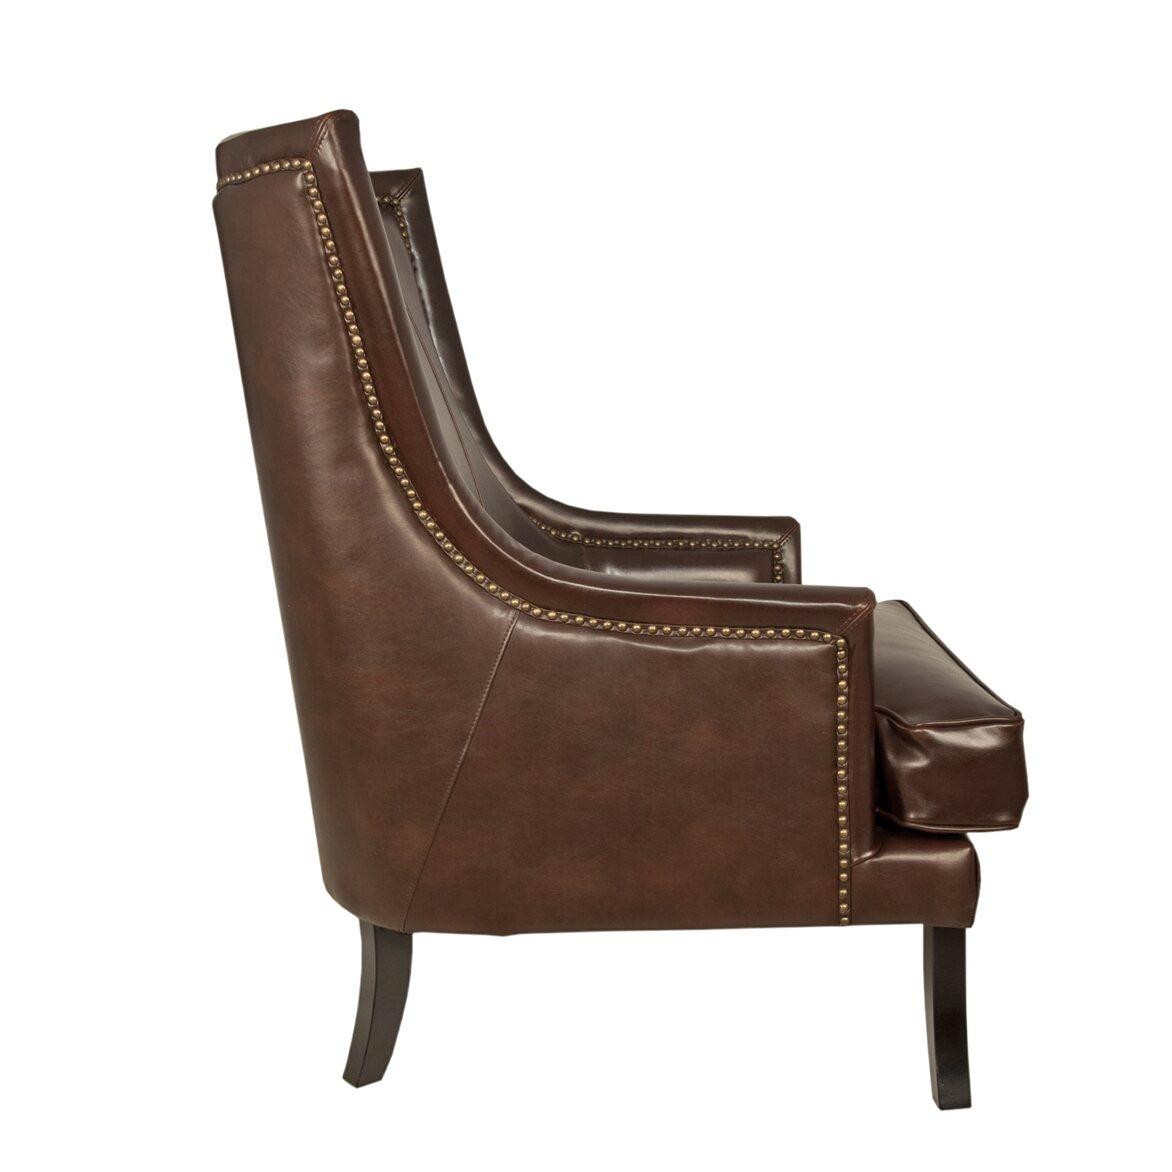 Кожаное кресло Chester 2 | Кожаные кресла Kingsby